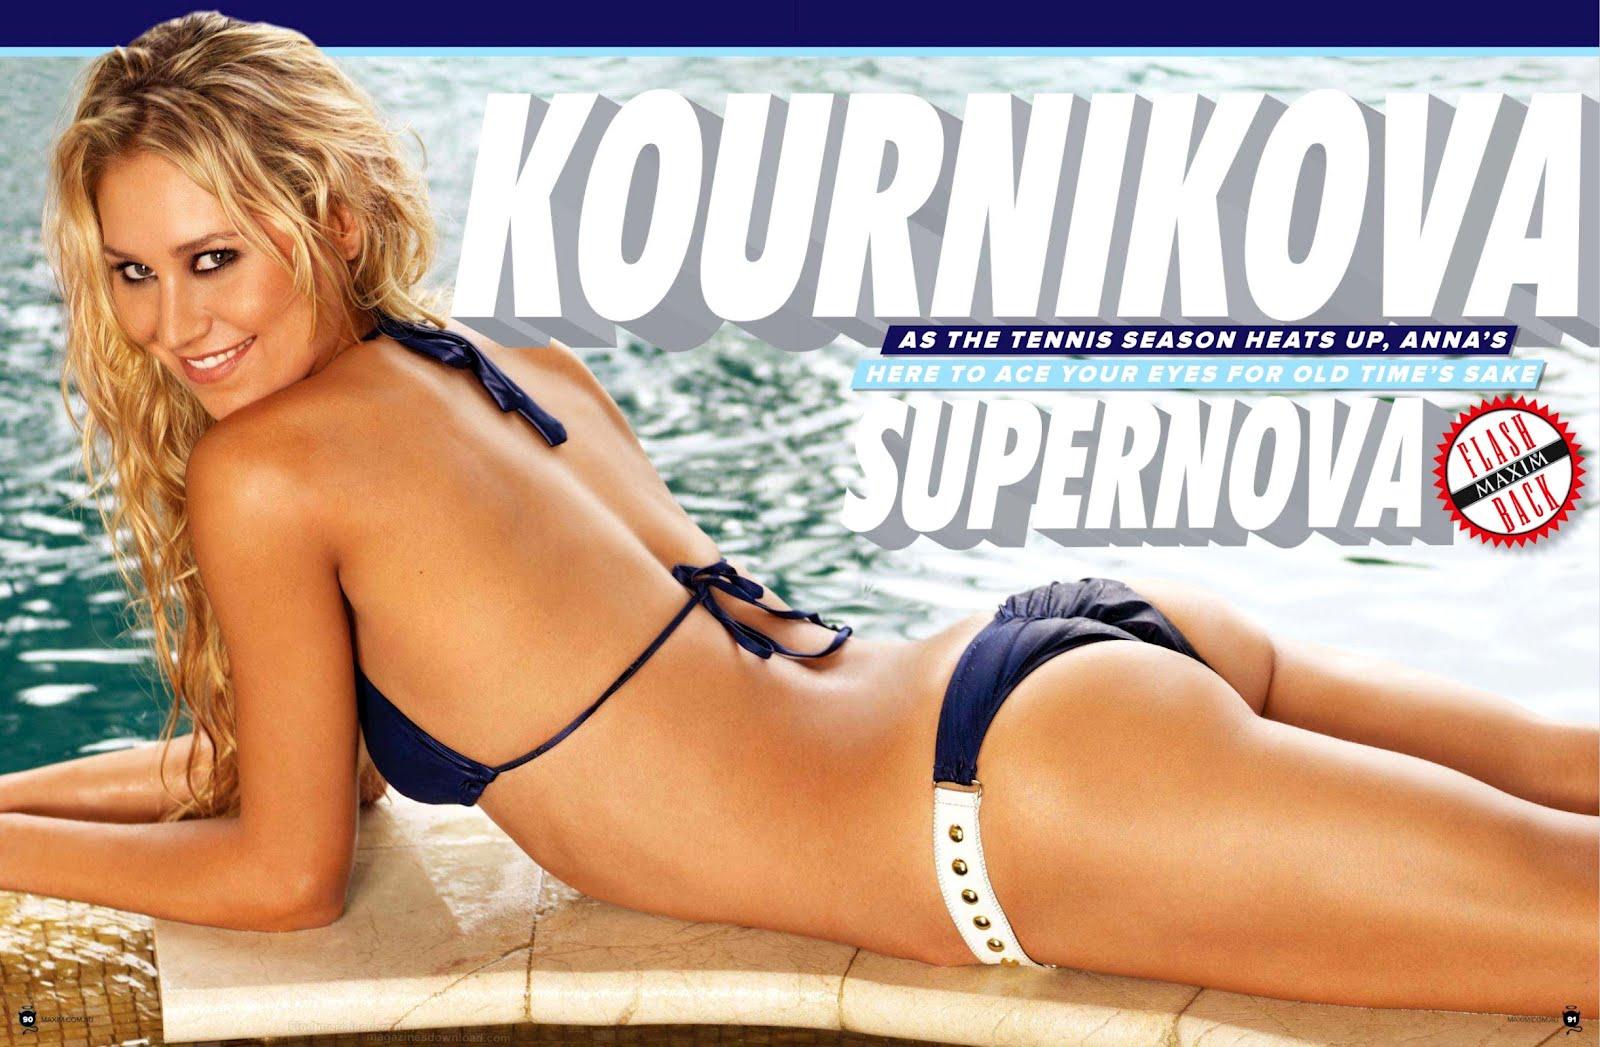 http://1.bp.blogspot.com/-P9OiHAzwRH8/UEqZNkgaTQI/AAAAAAAACQs/X0fwDTRi72c/s1600/Anna-Kournikova-Maxim-Australia-Sept2012.jpg